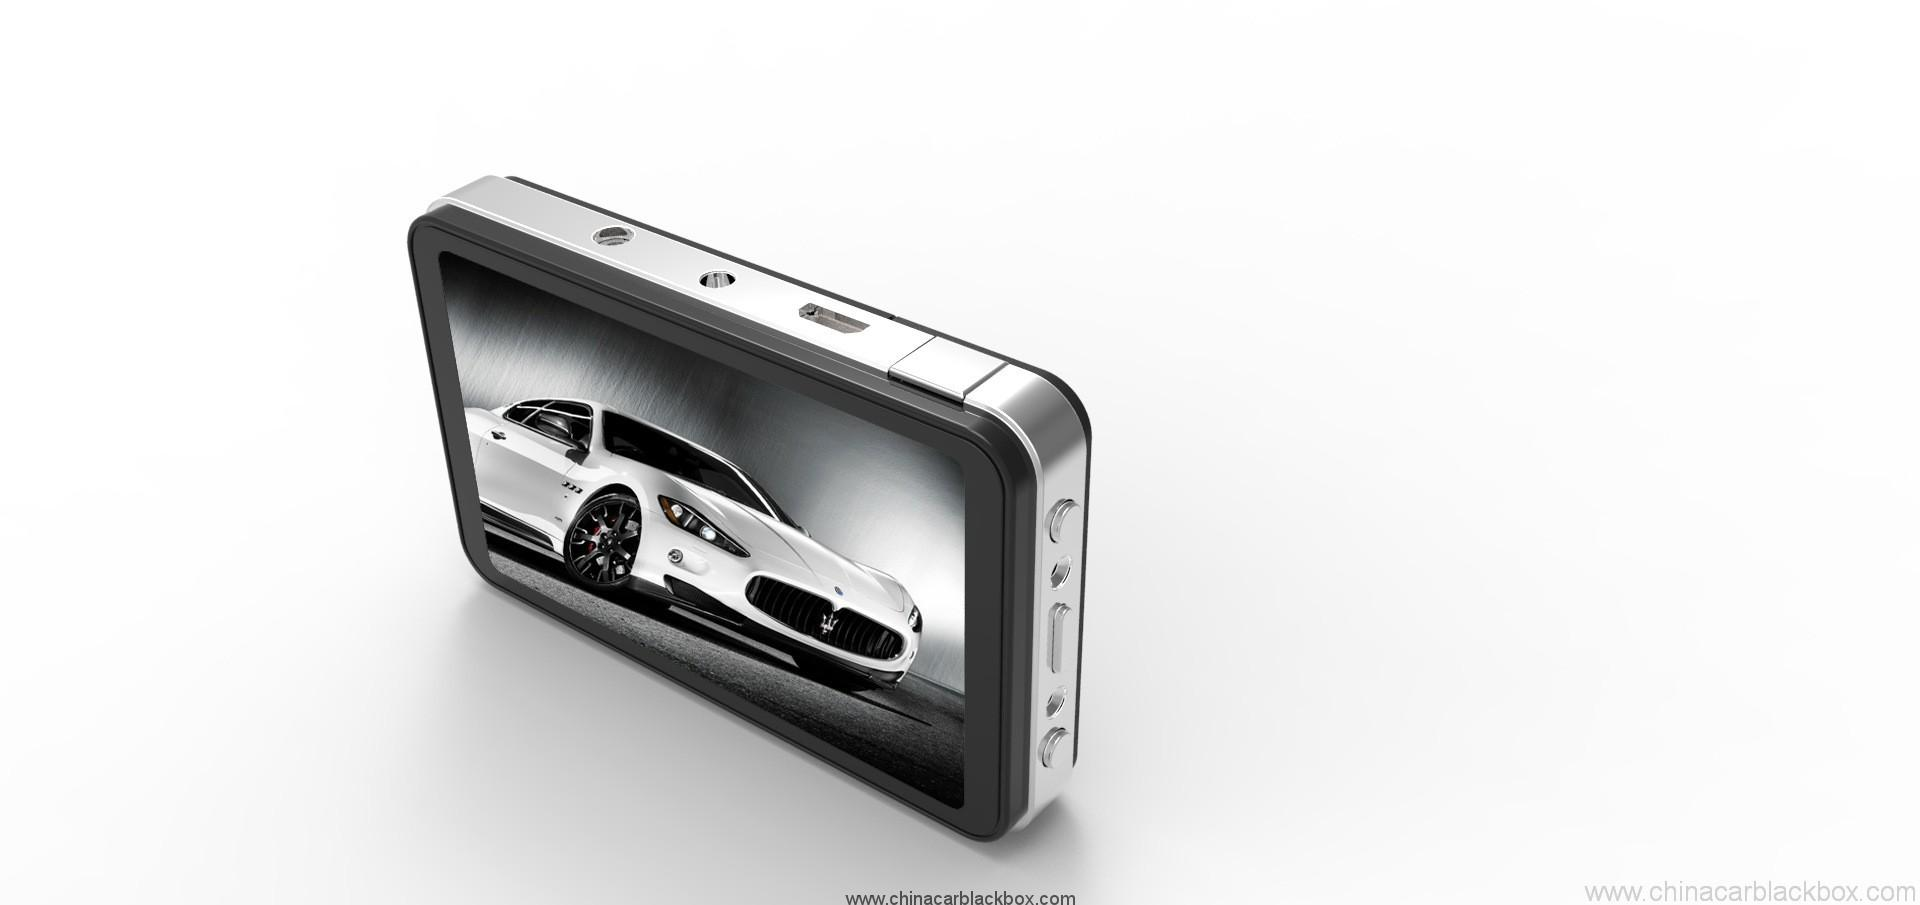 HD car dvr camera car black box with wide angle lens 4